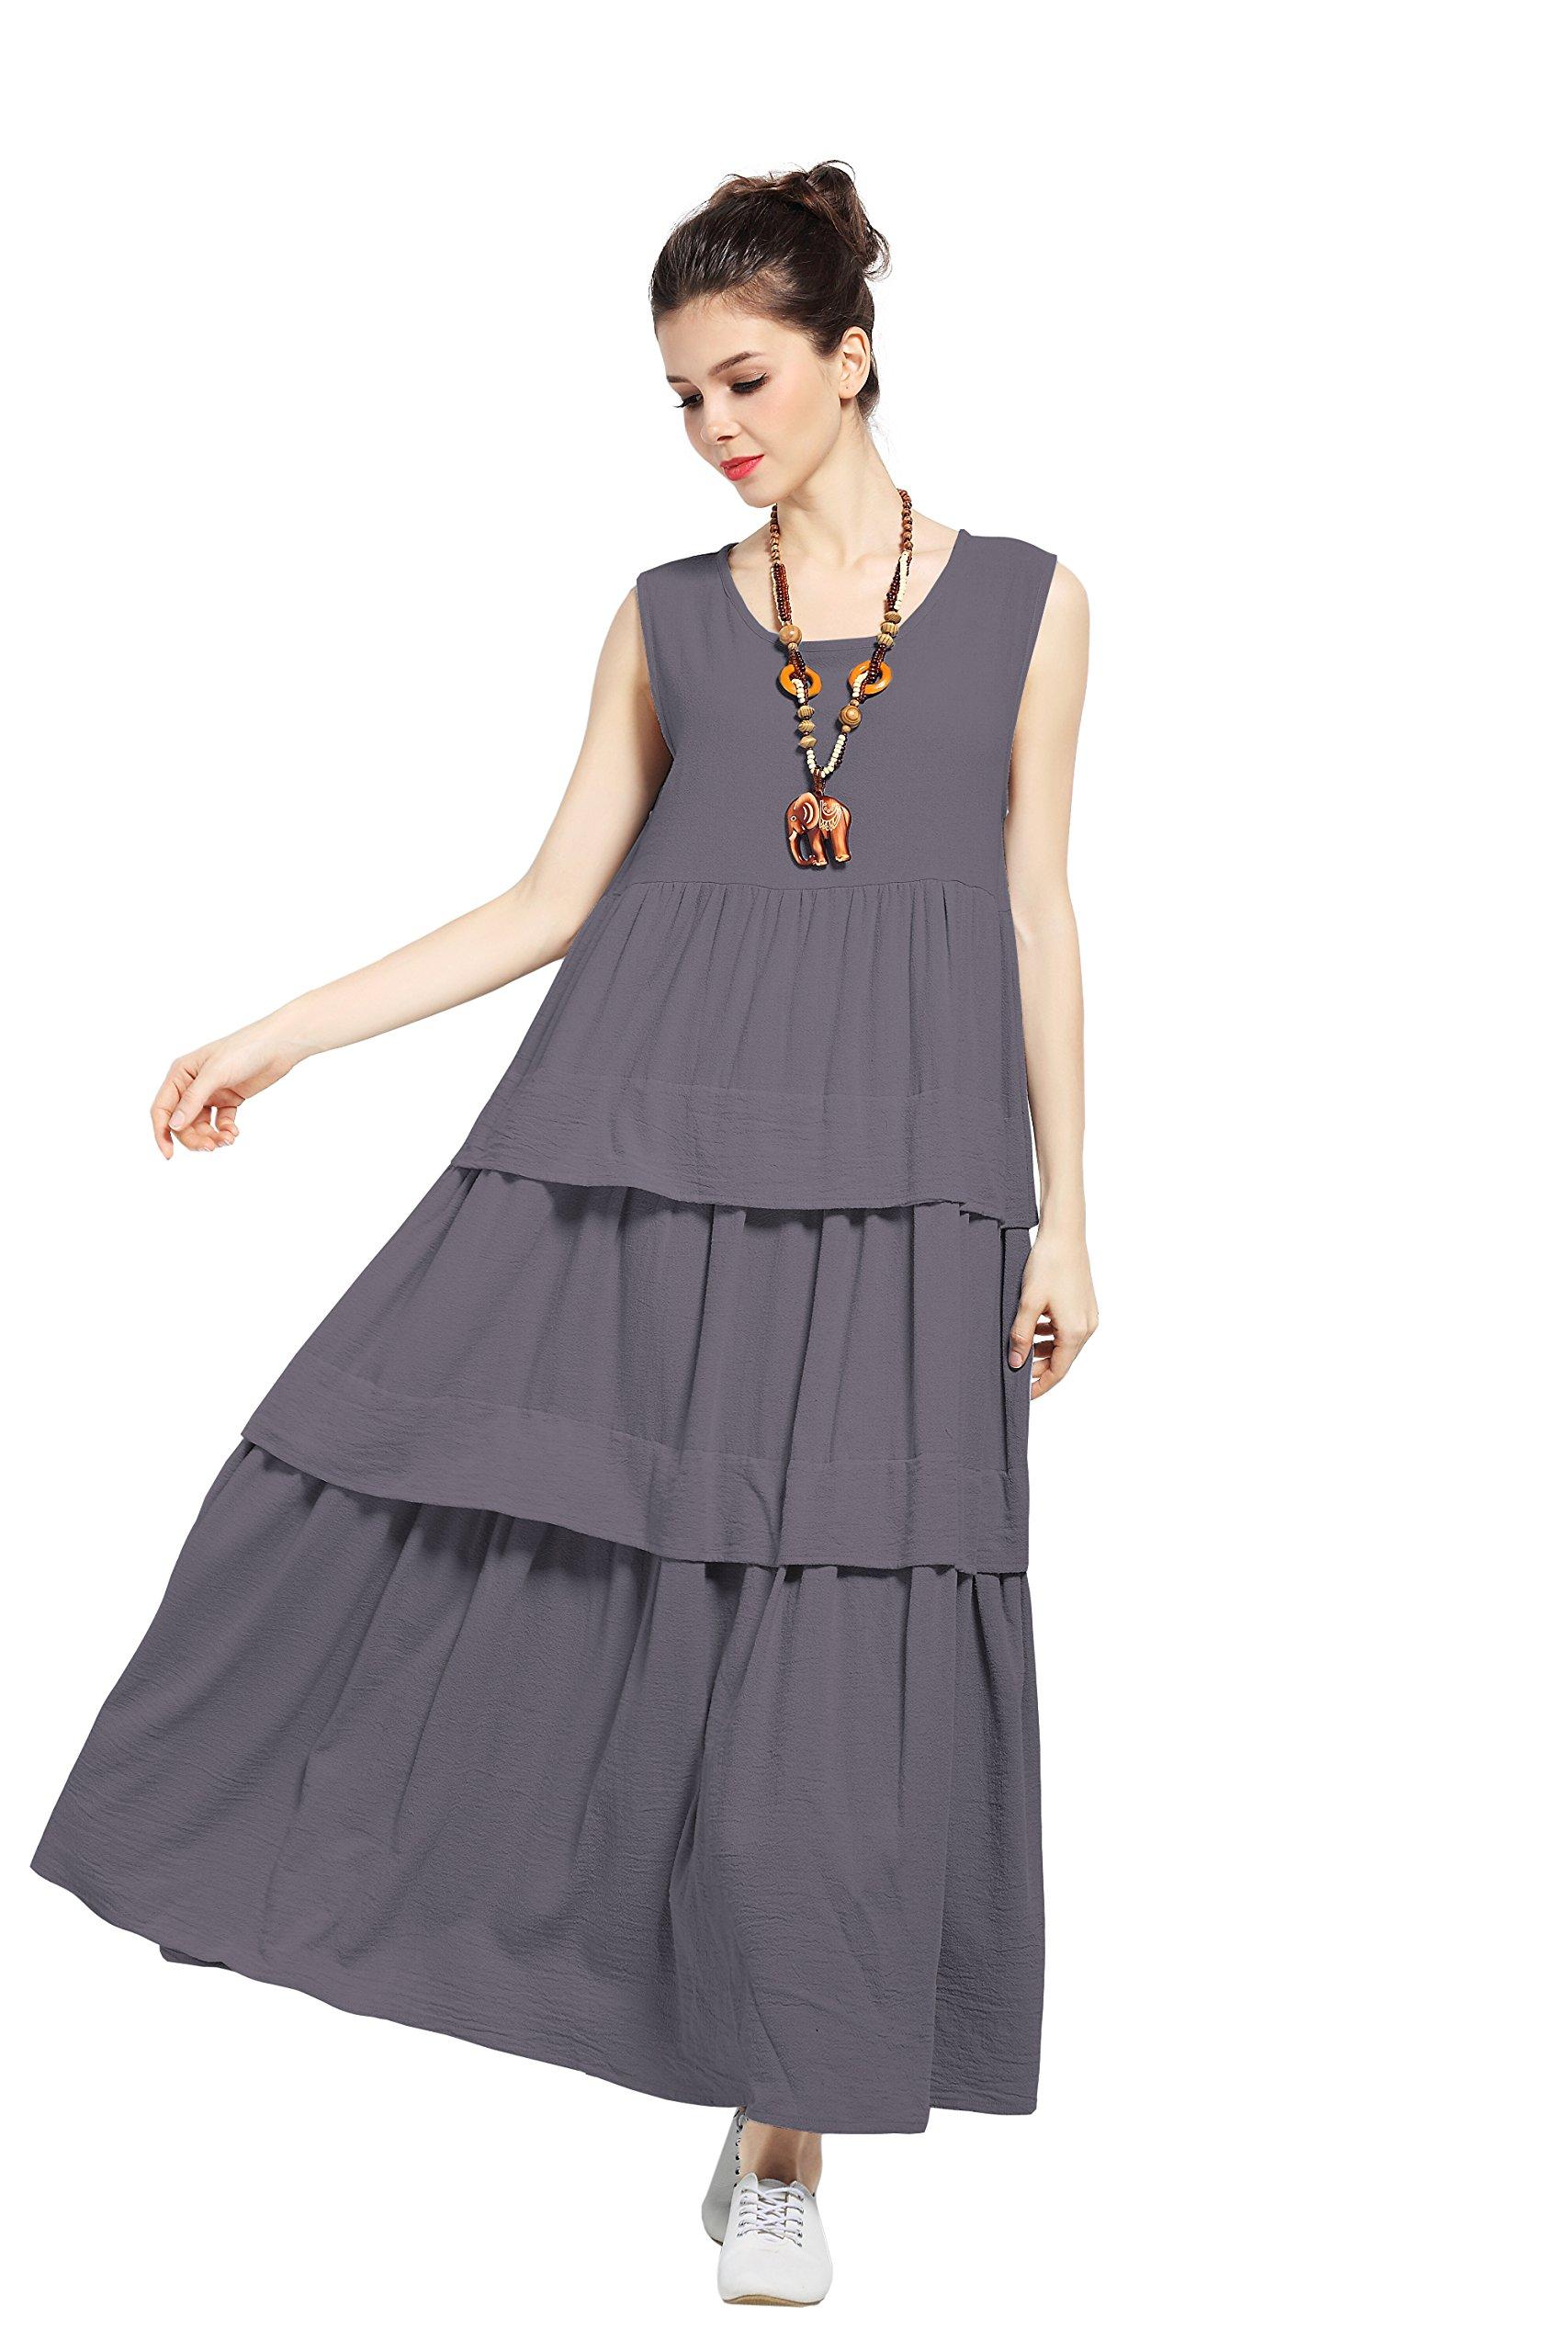 Anysize Sleeveless Layered Dress Linen&Cotton Plus Size Spring Summer Dress F94B